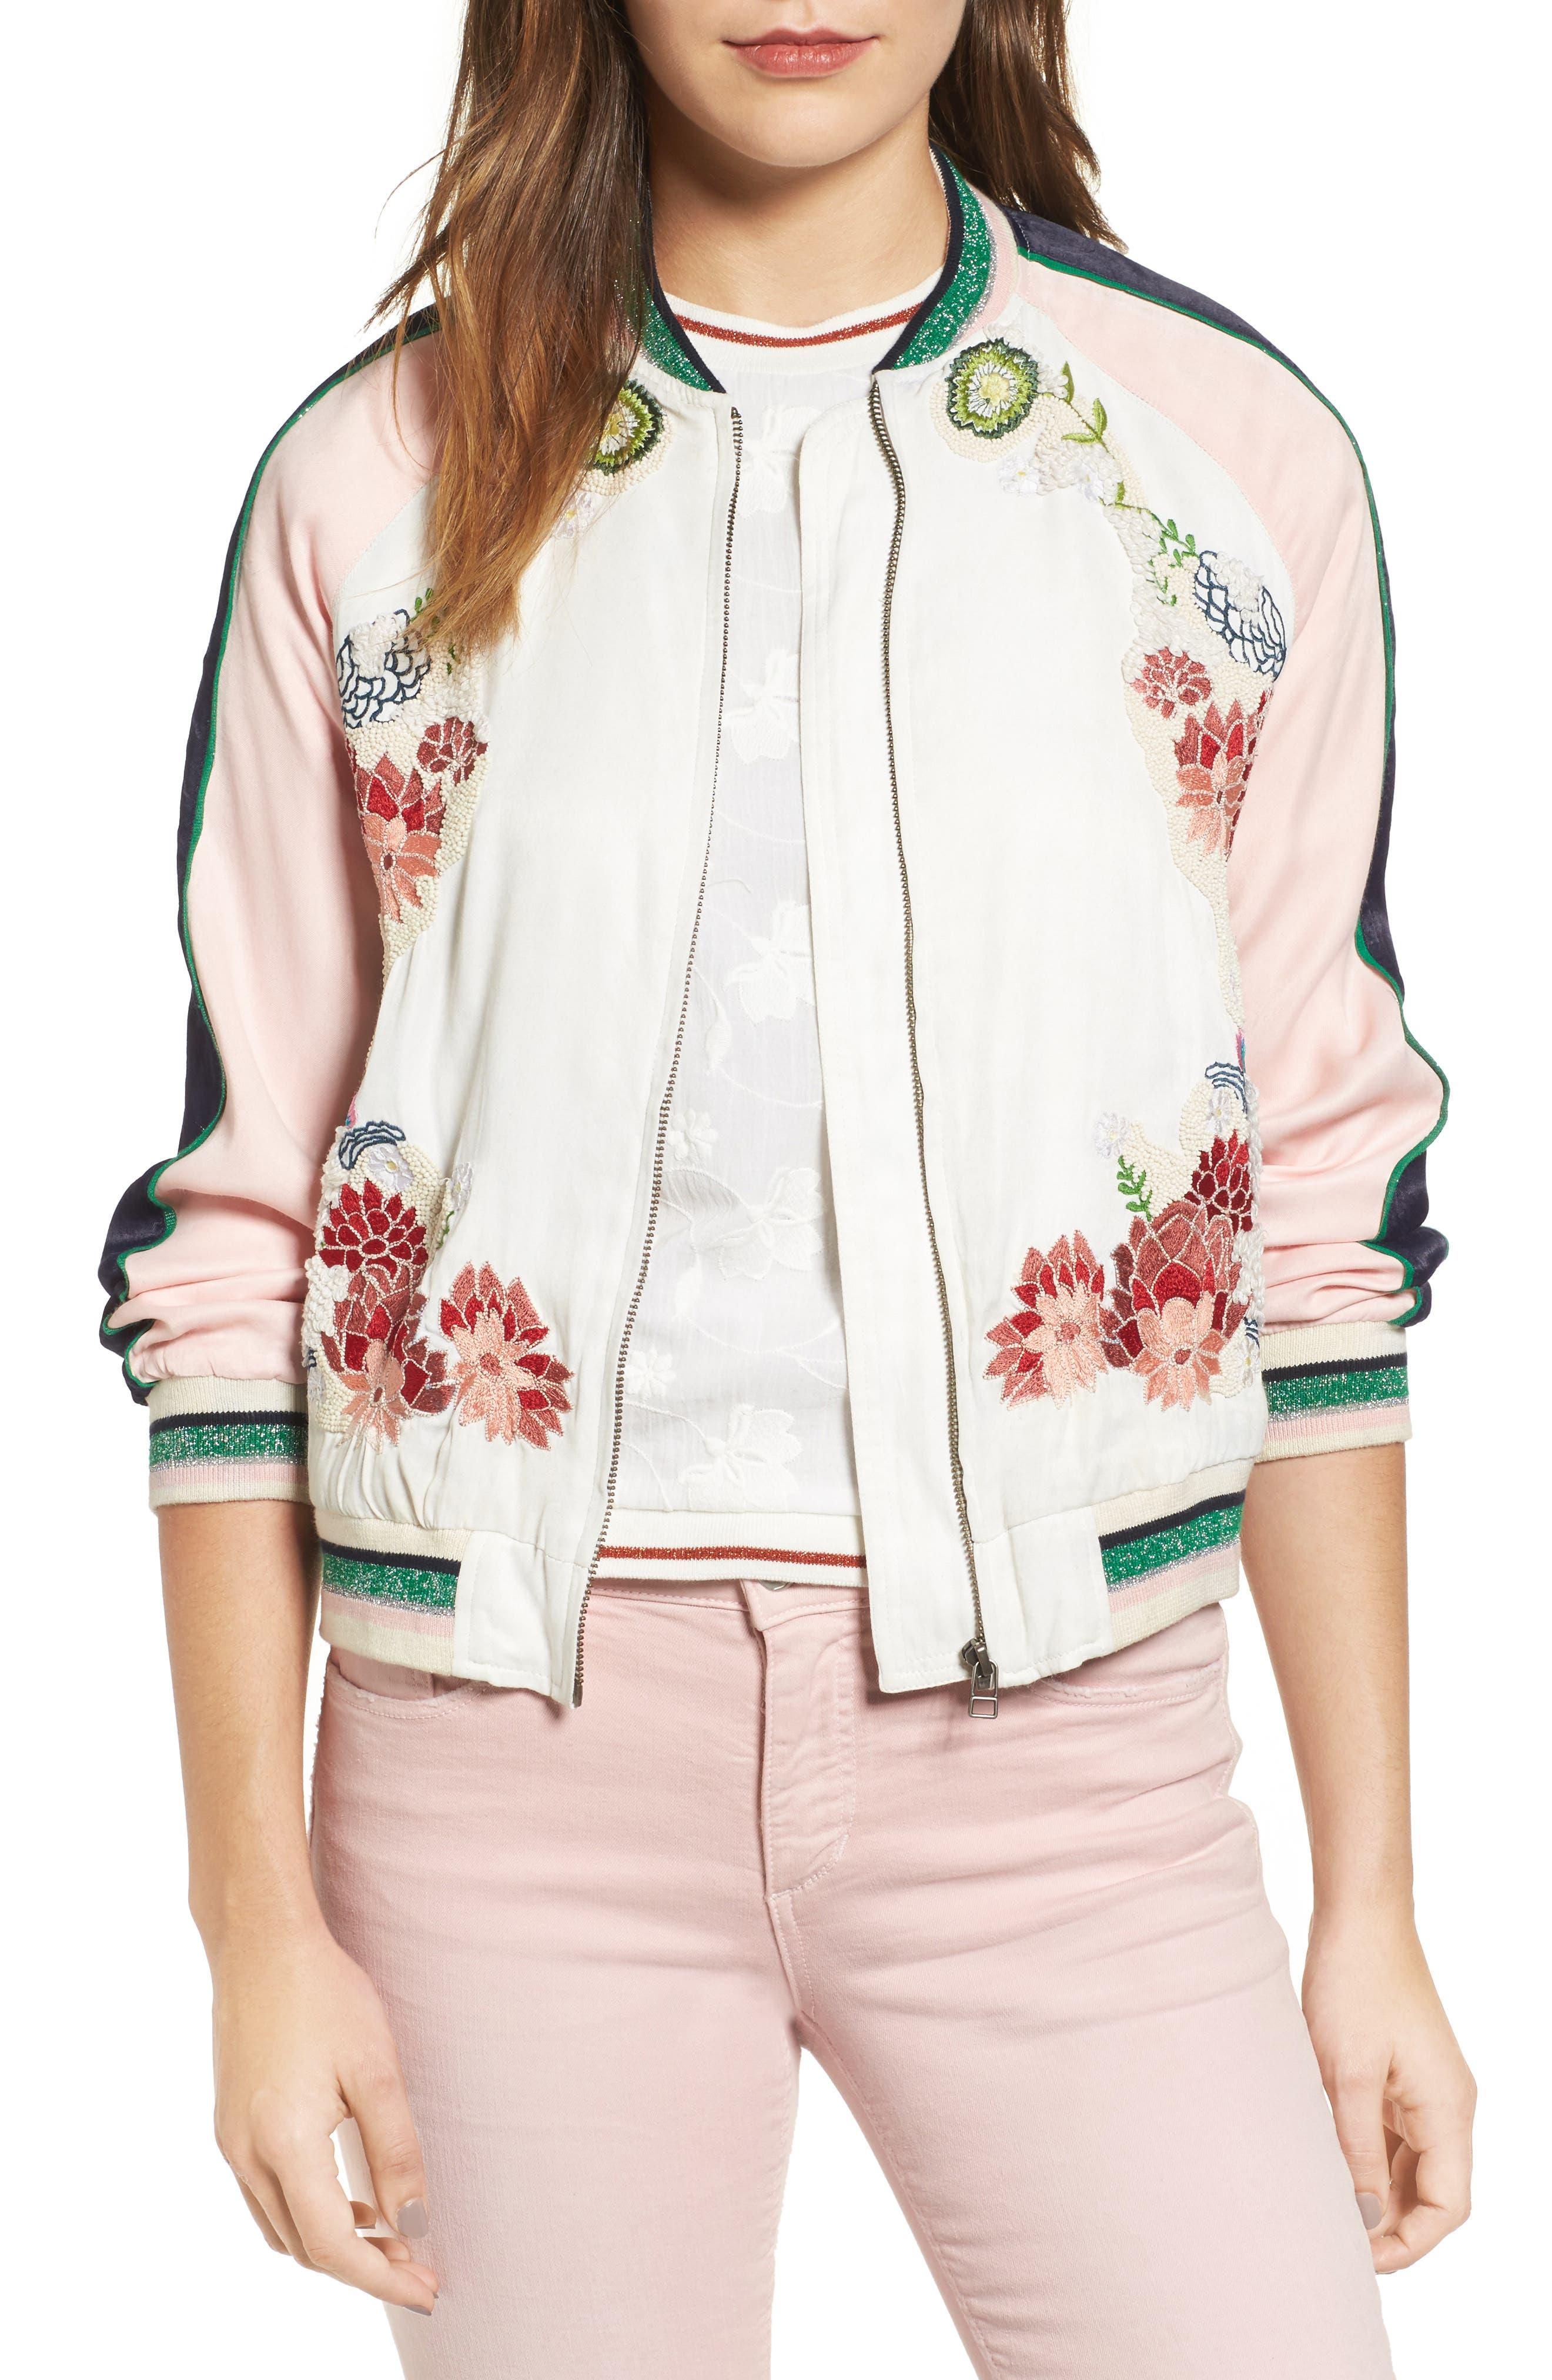 Alternate Image 1 Selected - Paul & Joe Sister Les Fleurs Embroidered Bomber Jacket